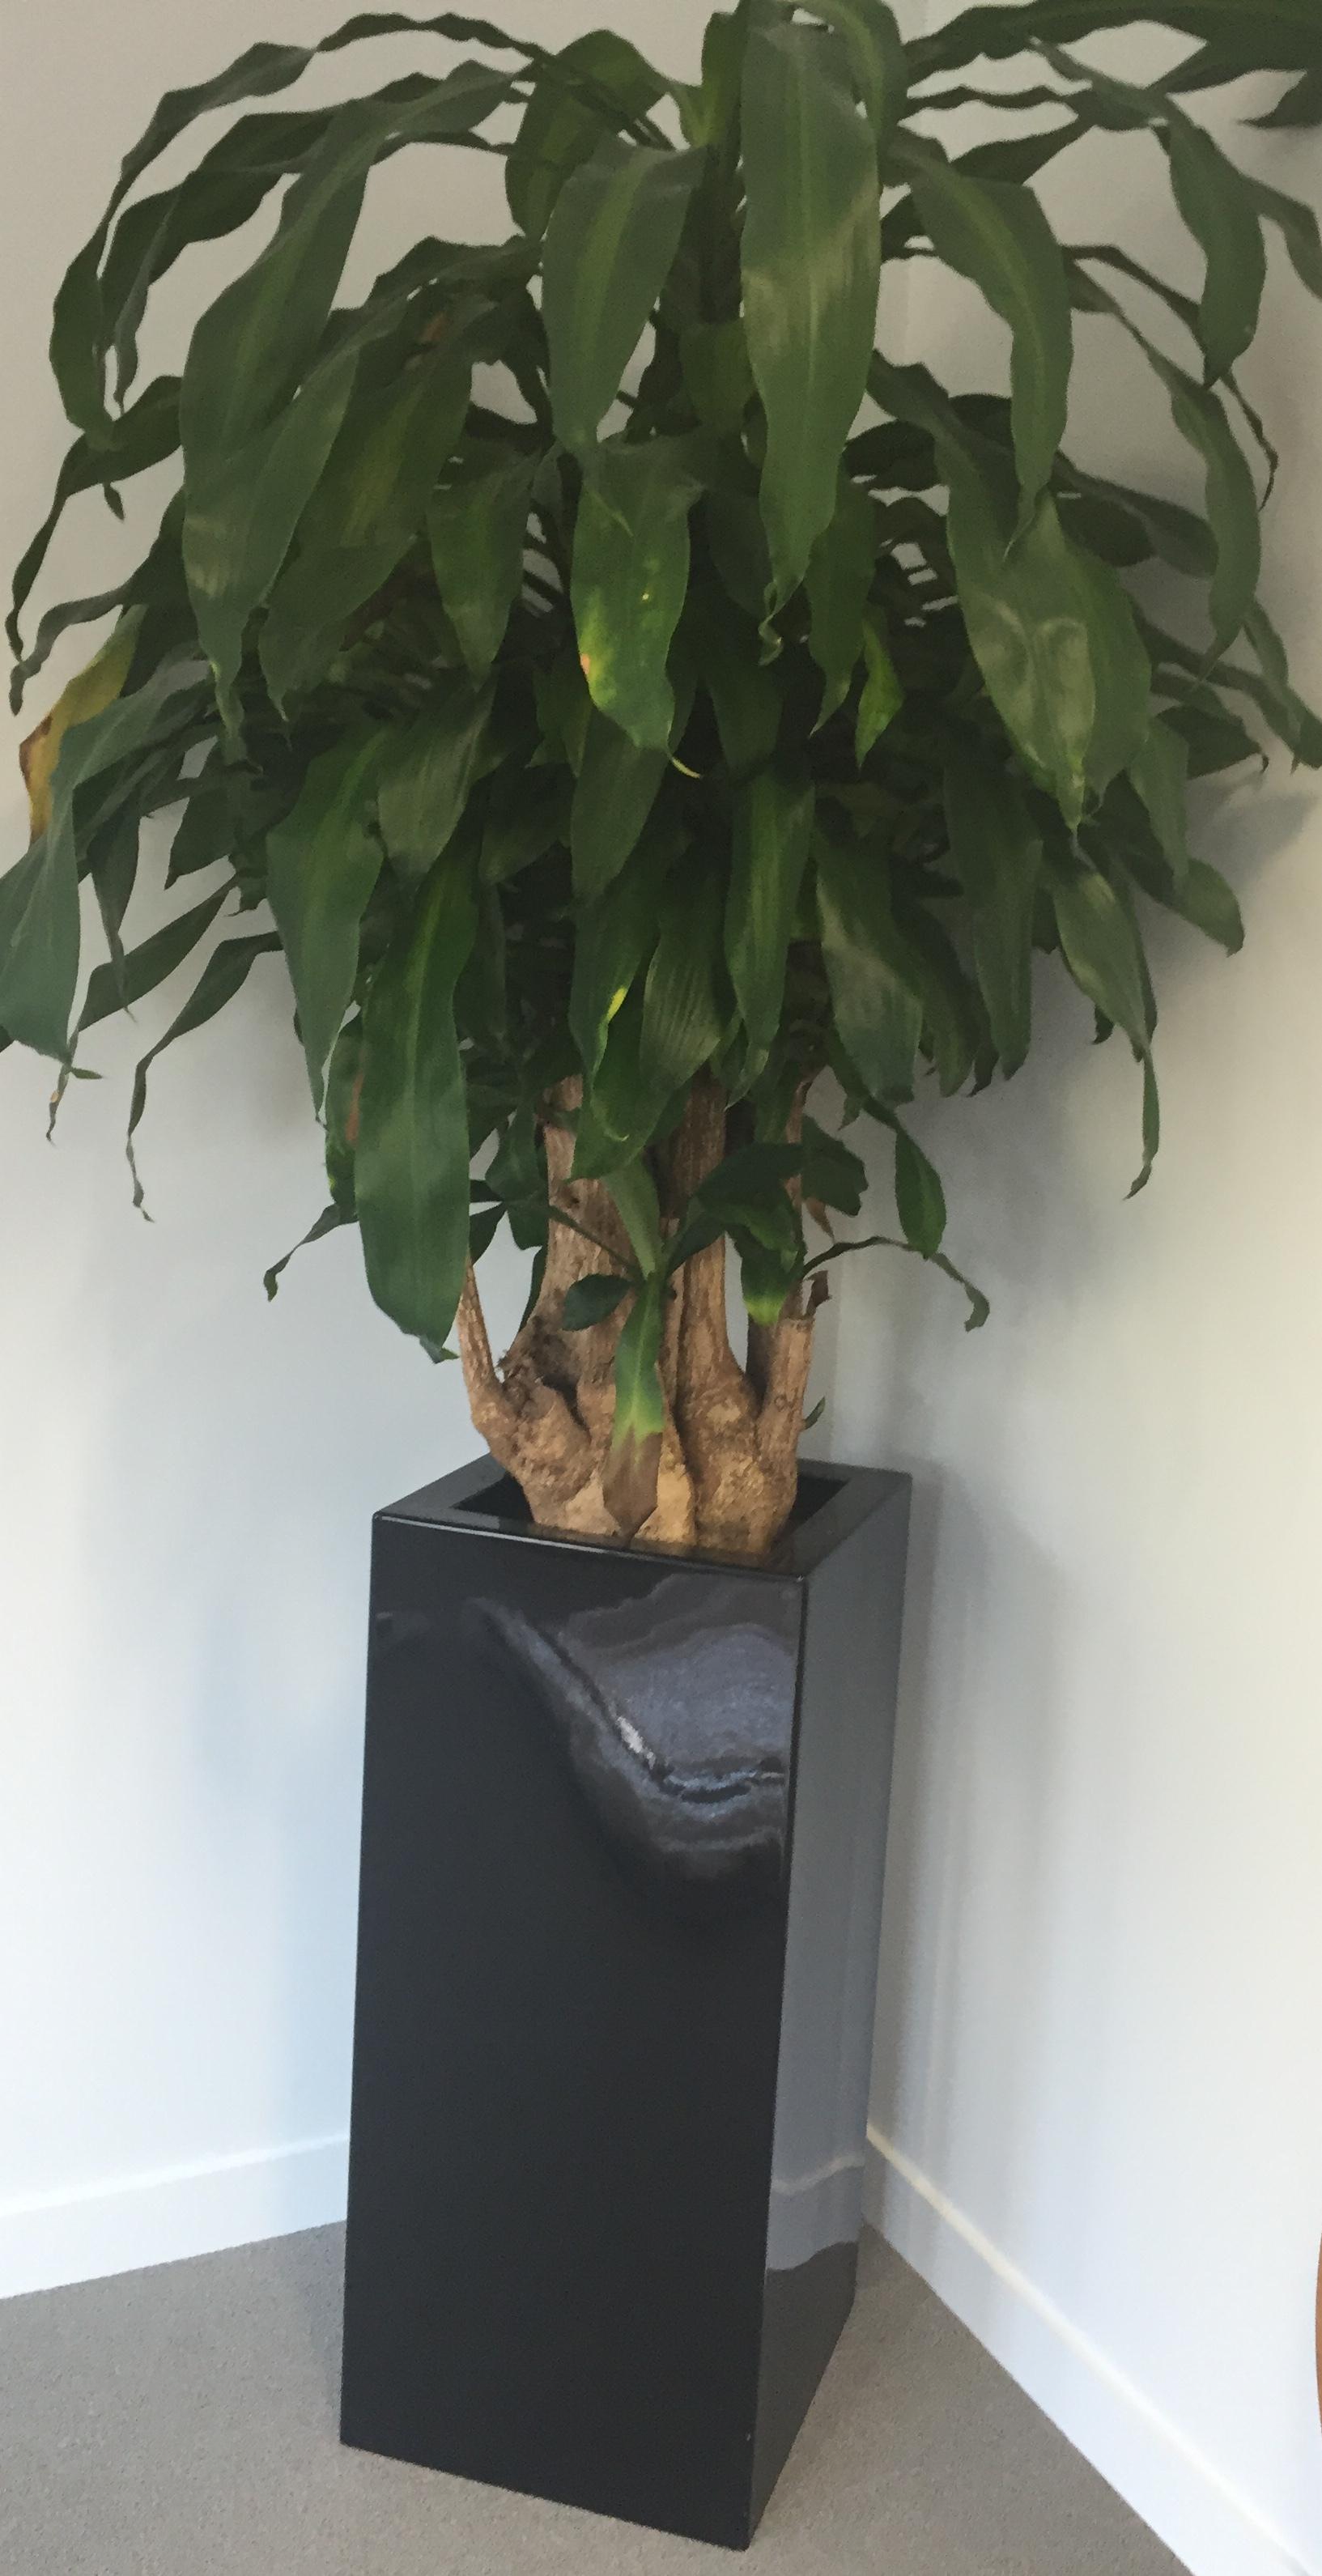 Lot 15 - 2x Large Potted Plants